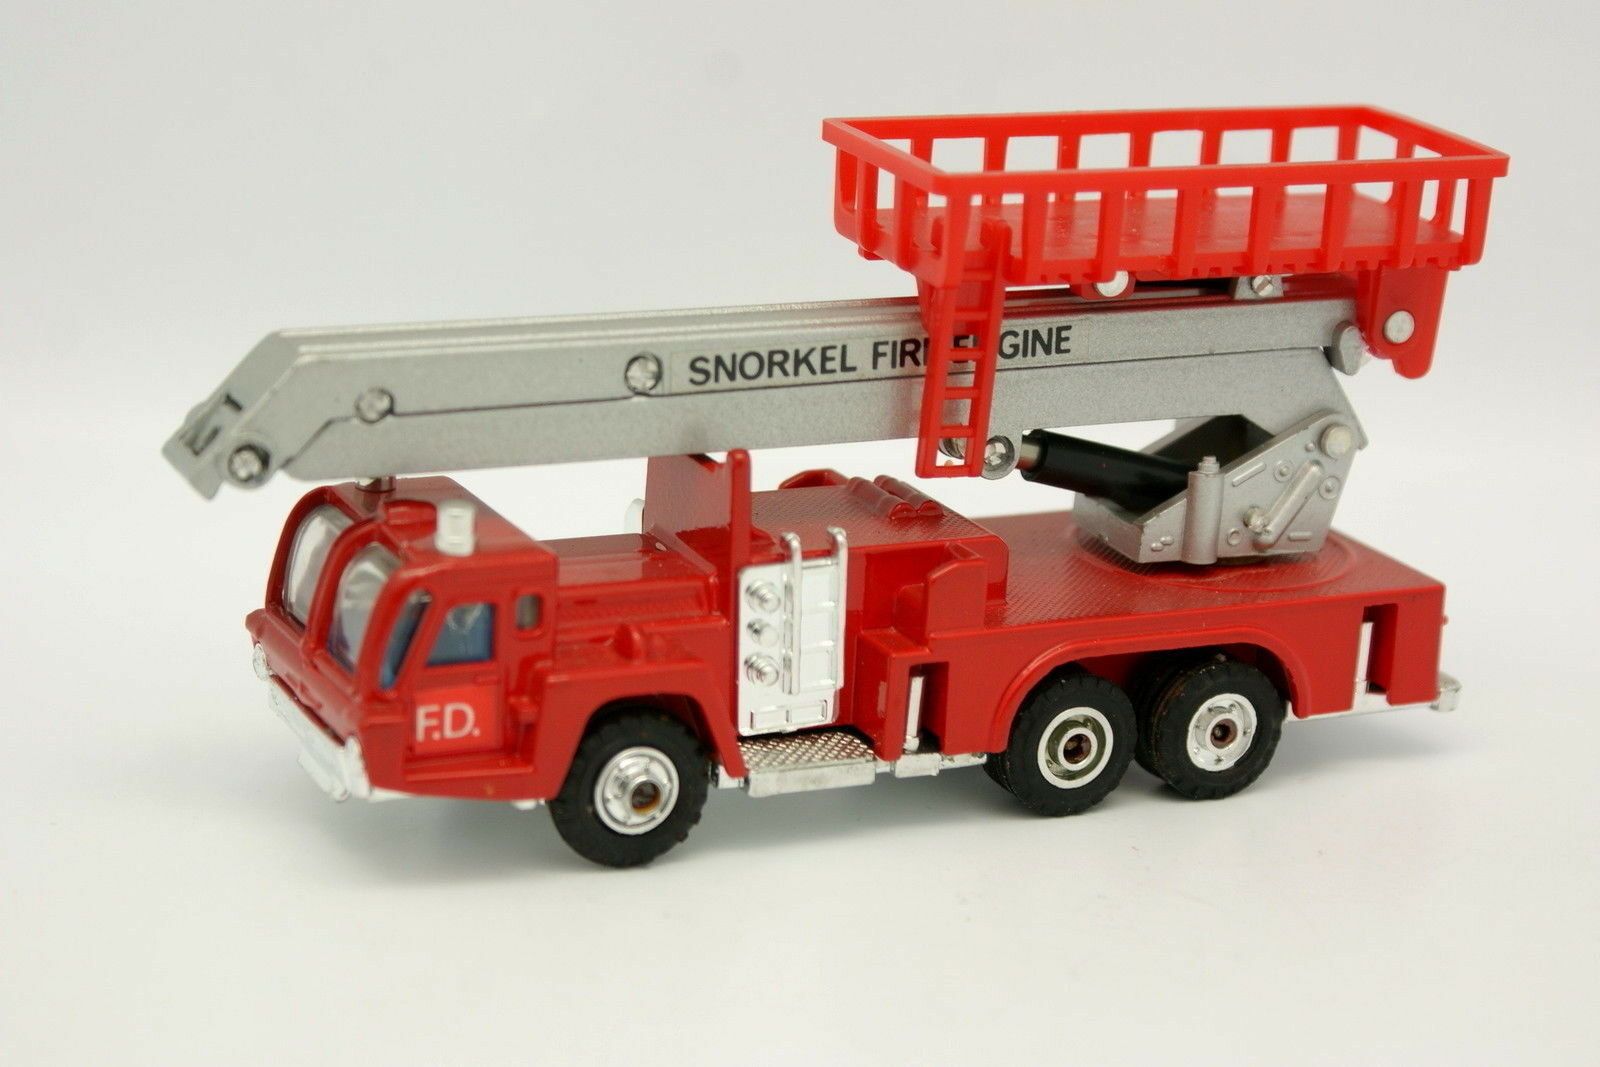 Shinsei Mini Power 1 78 - Simon Snorkel Snorkel Snorkel Fire Engine Gondel Doppelte Feuerwehr b6f66a